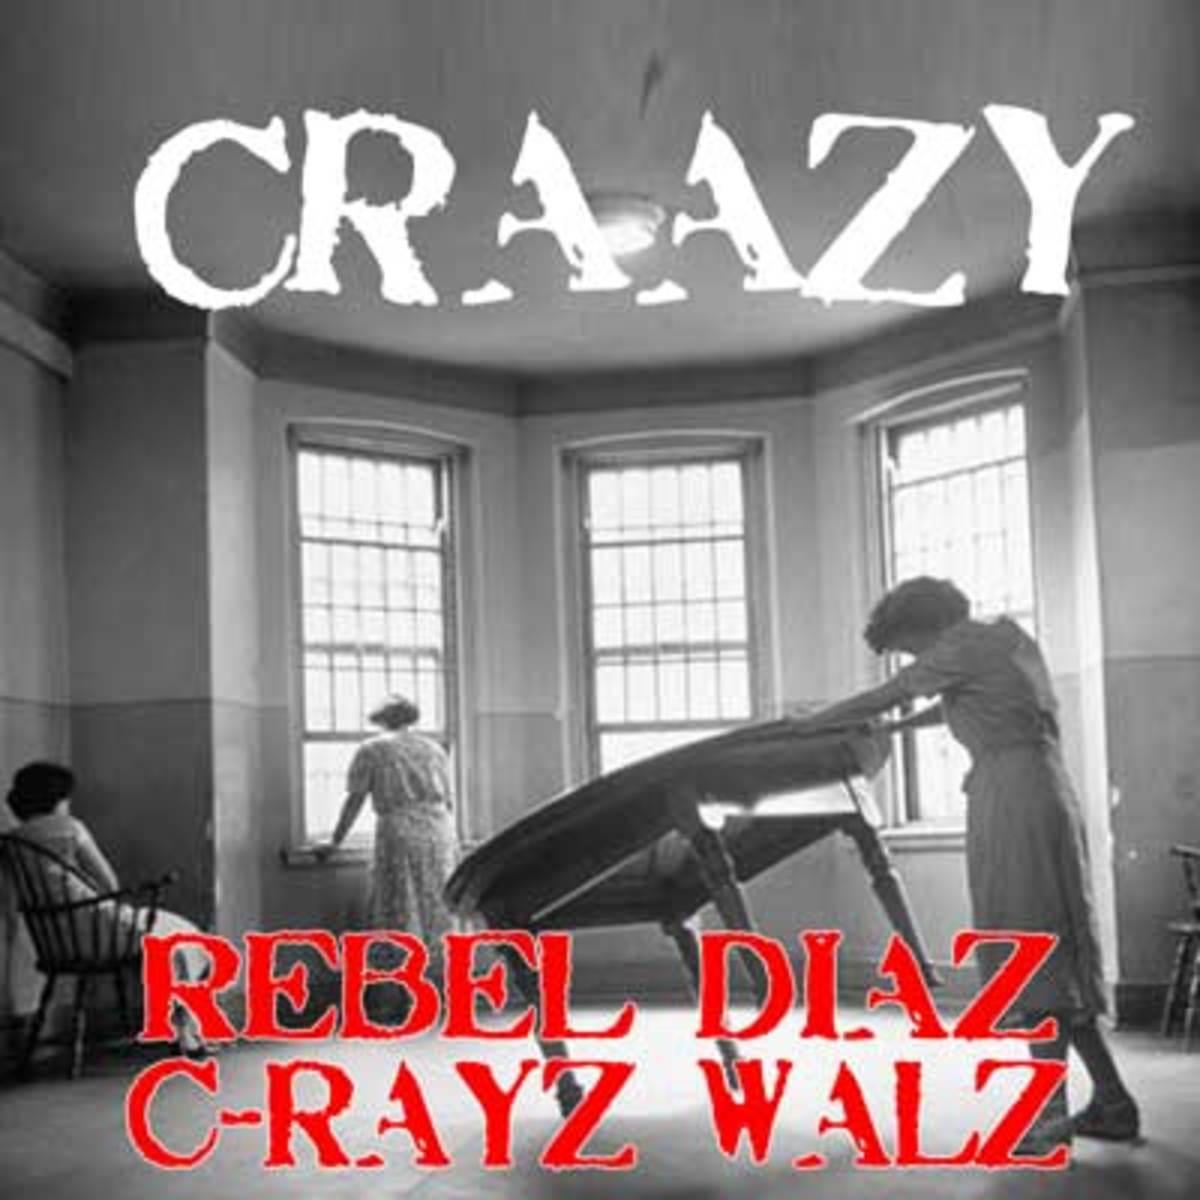 rebeldiaz-craazy.jpg